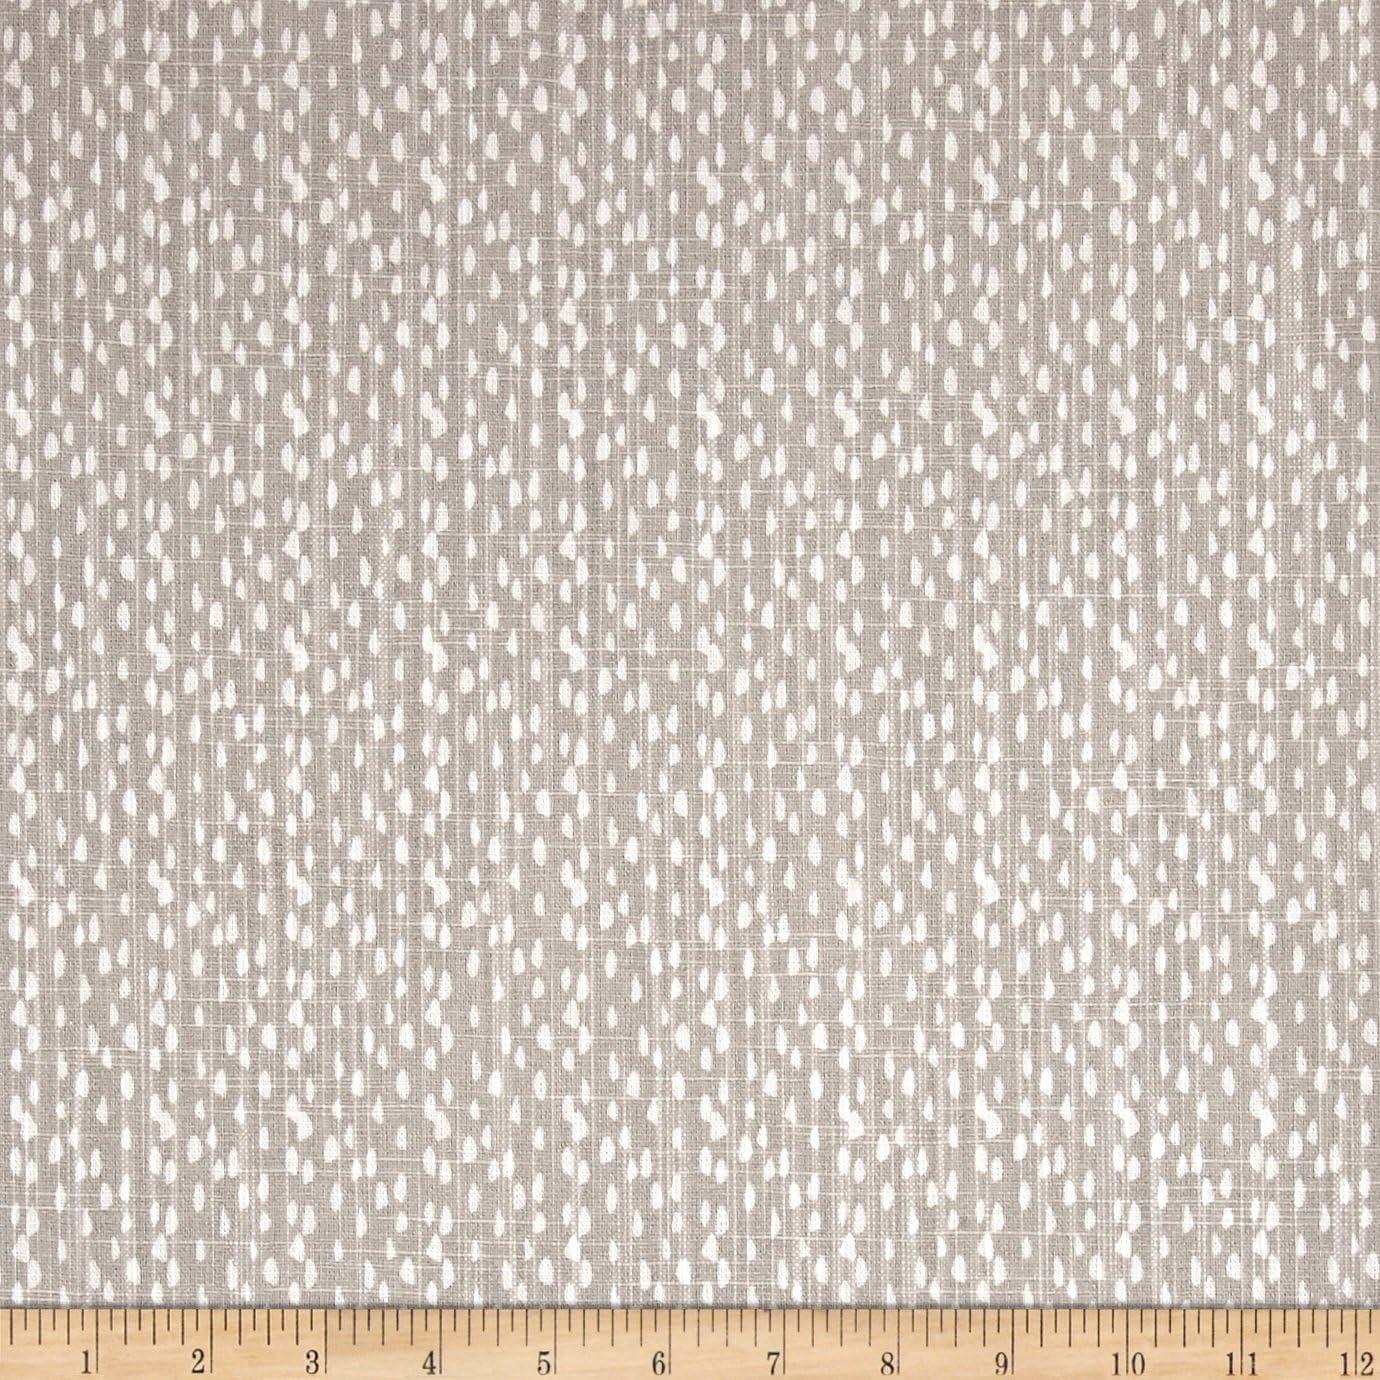 Premier Prints Fabric-MARIO-FRENCH GRAY-Slub Linen-Or-Color Choice-Fabric By The Yard-54 wide-Slub Canvas-Decorator fabric